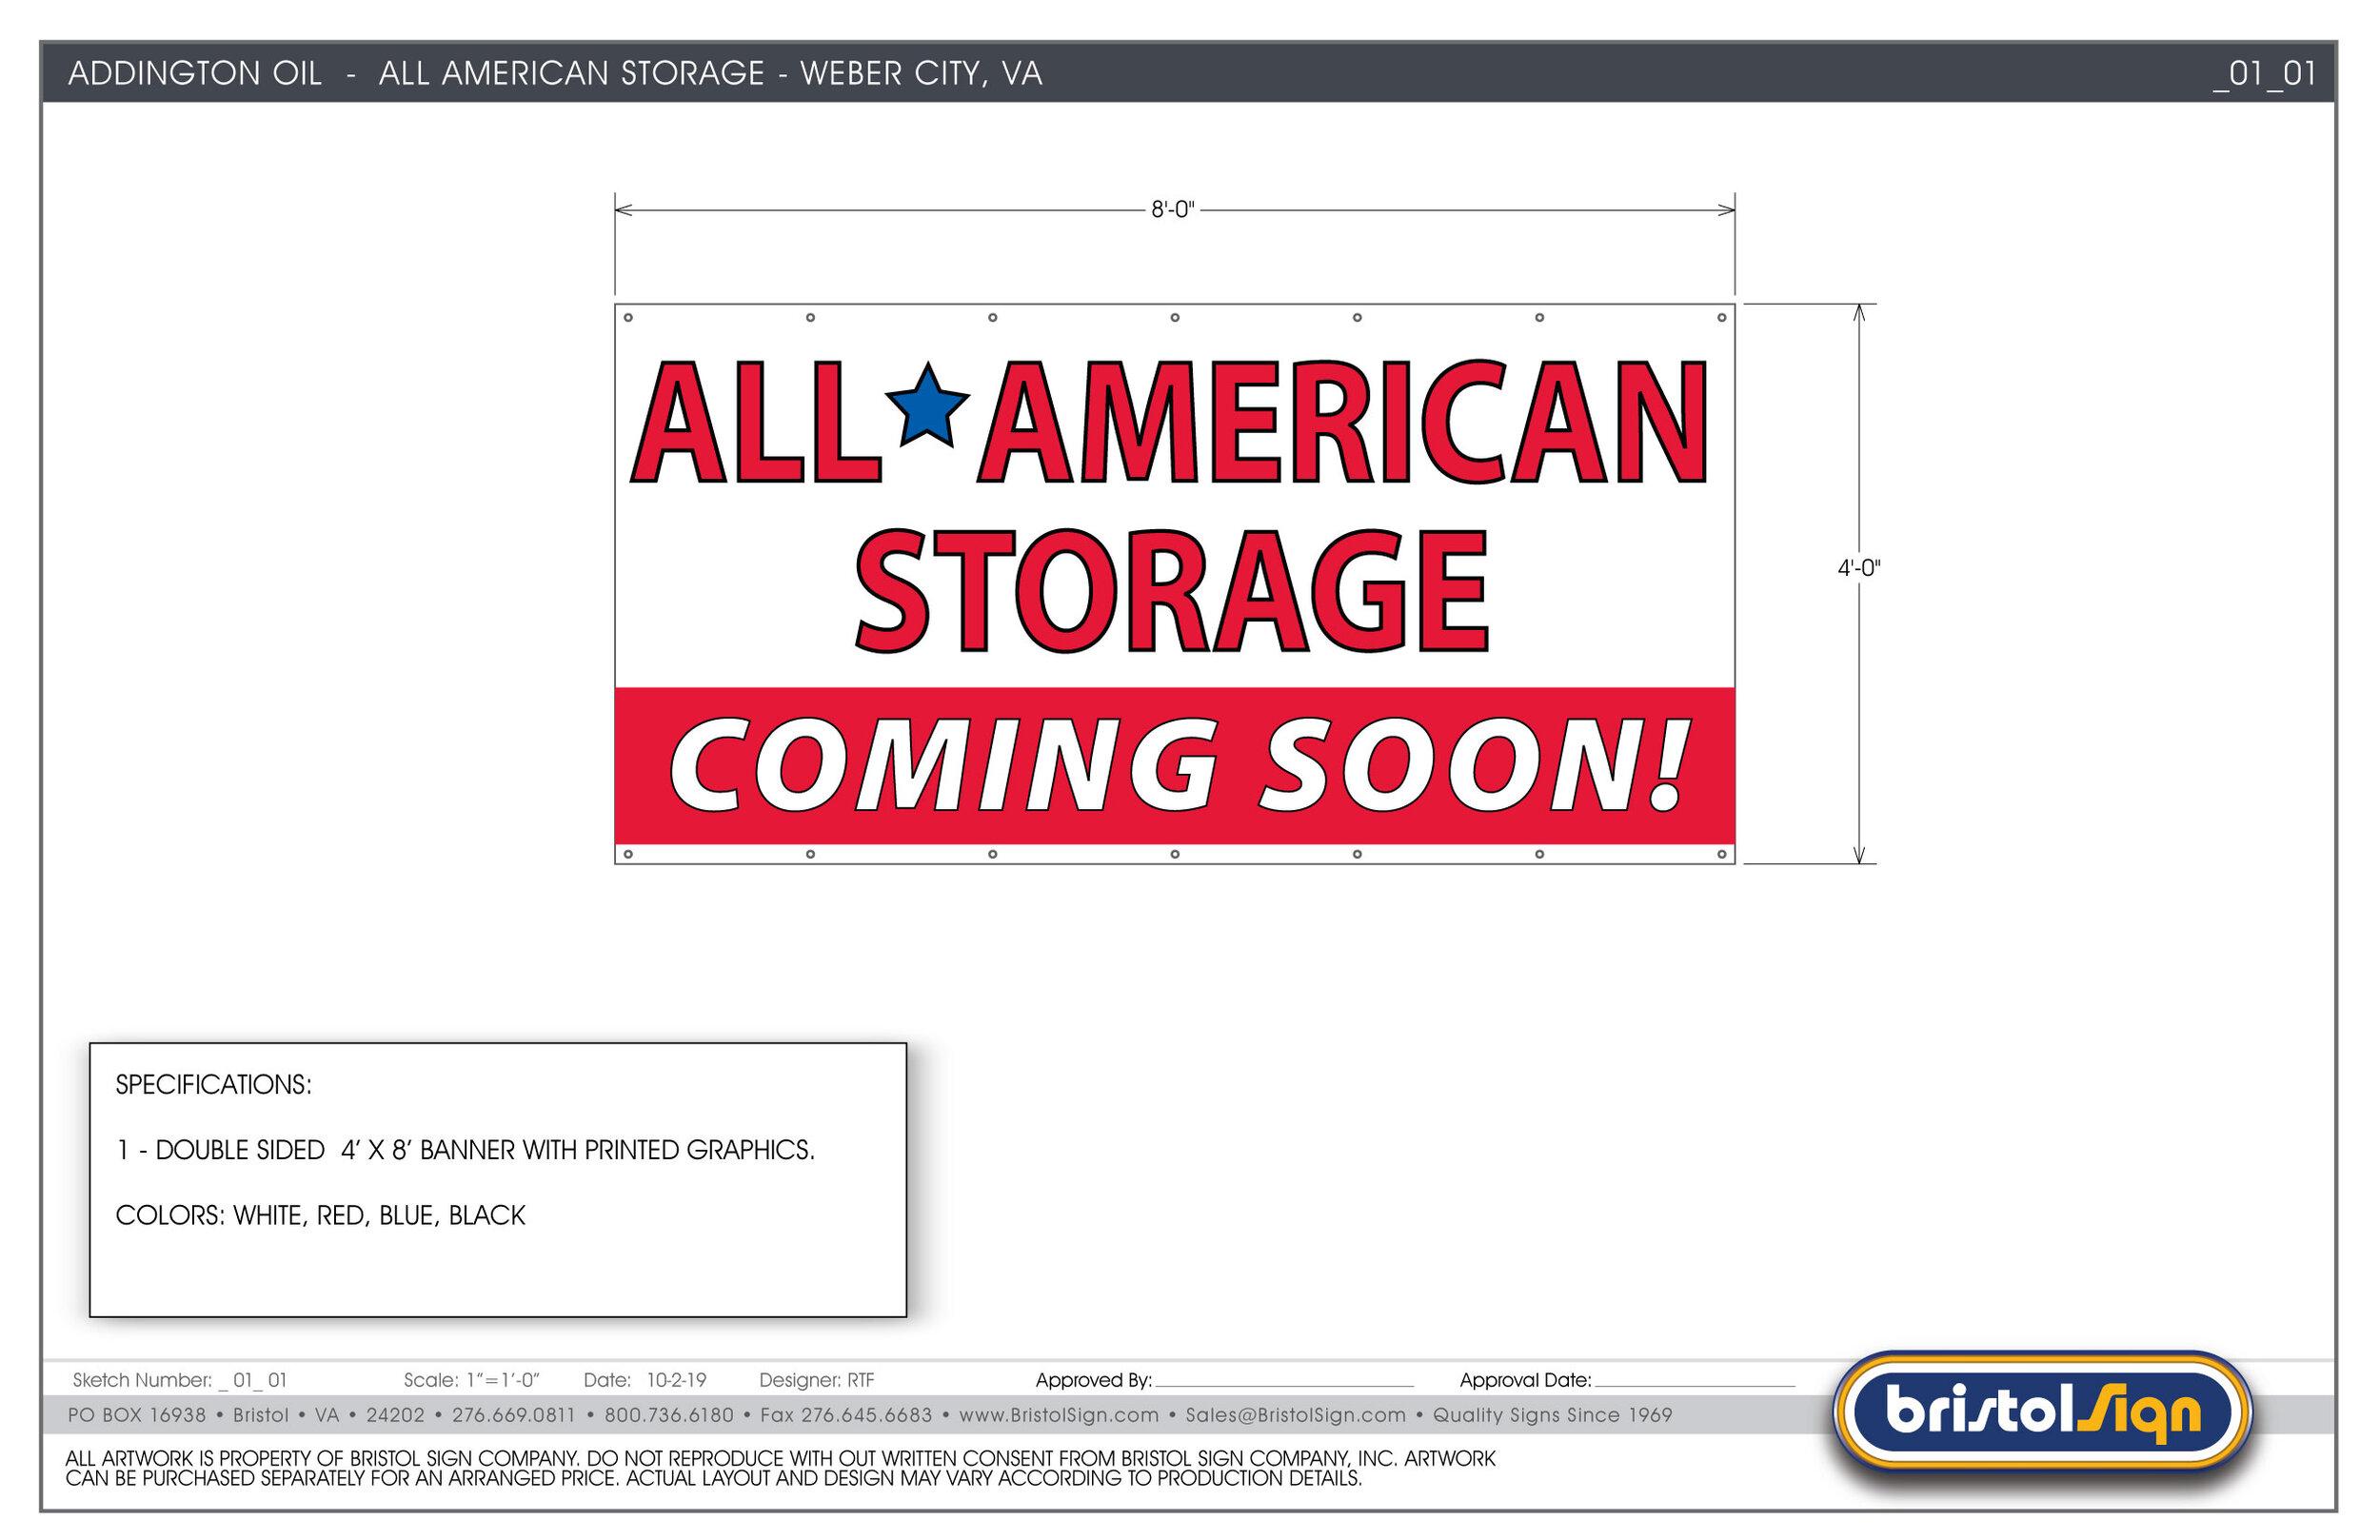 Addington Oil_All American Storage (Banner)_01_01.jpg